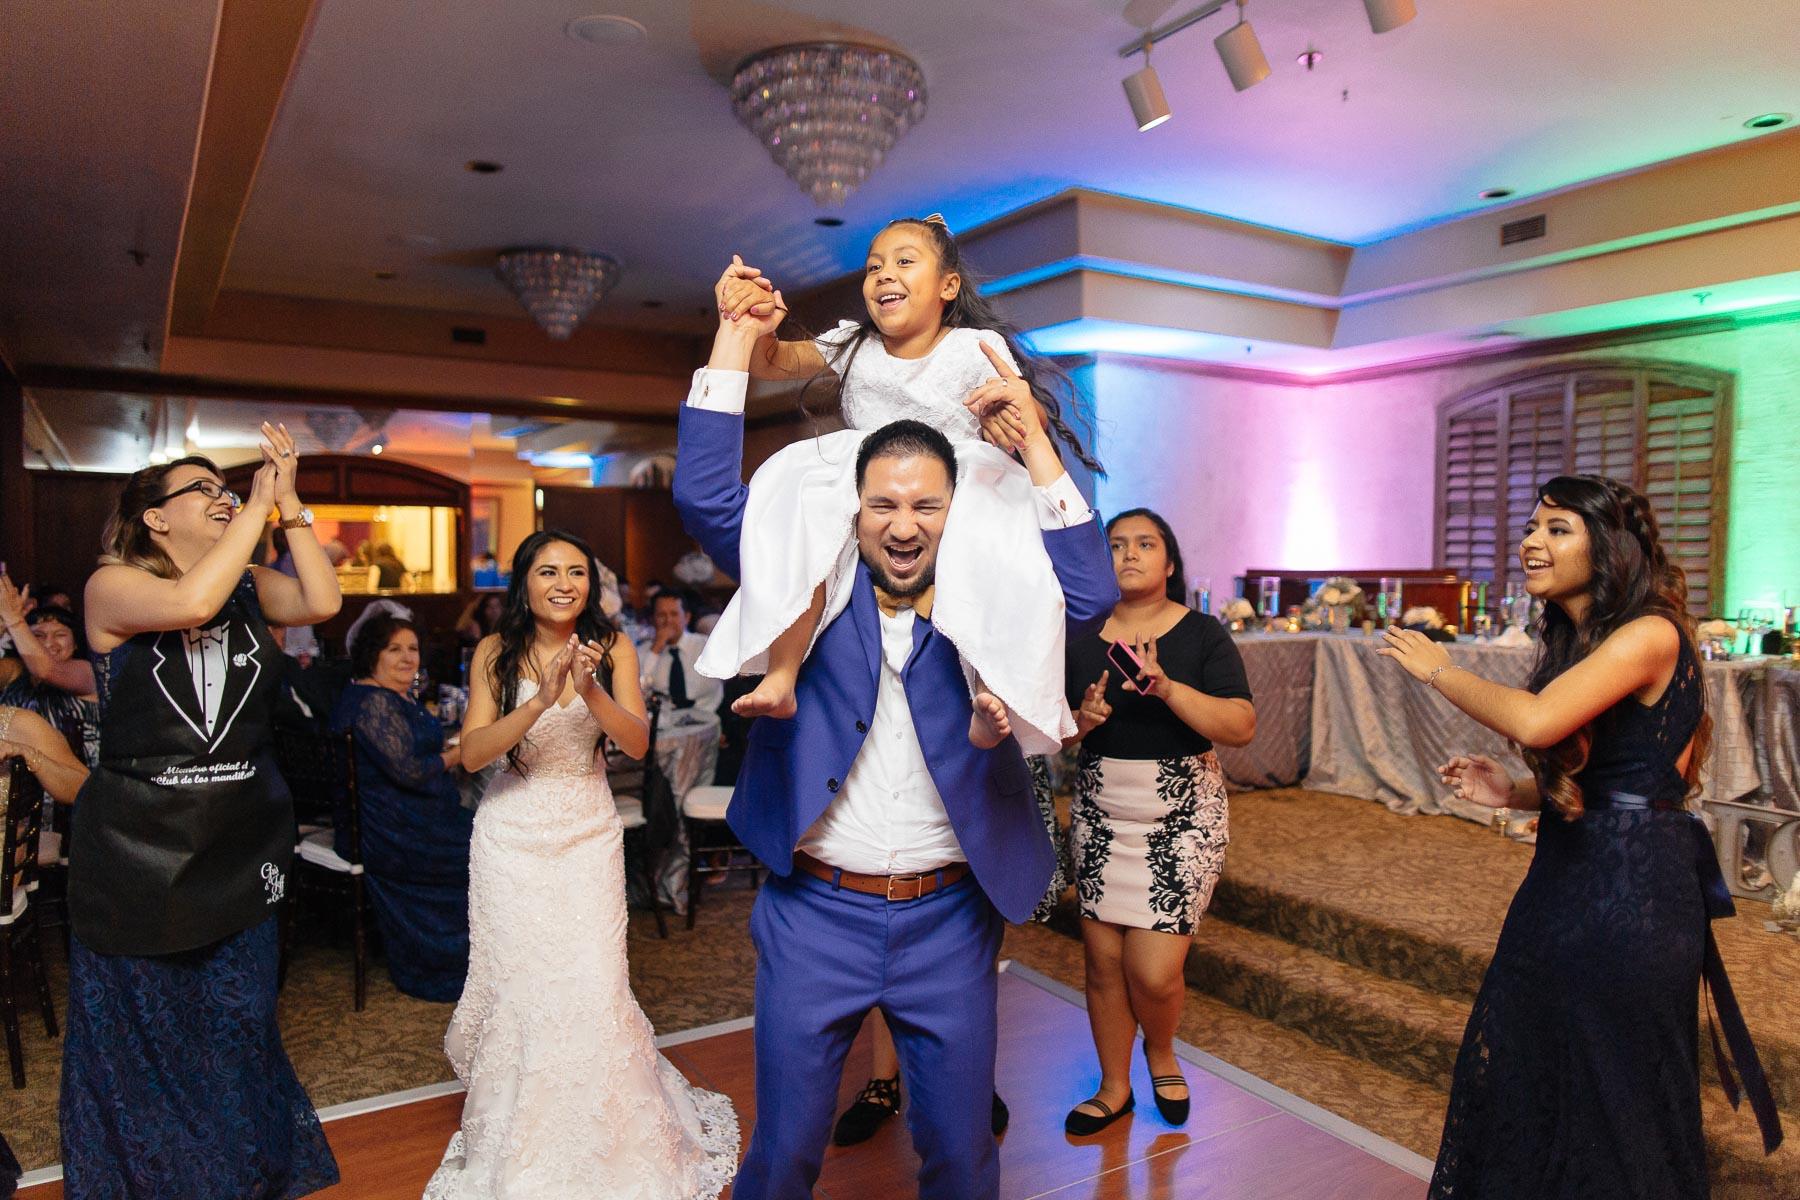 161029-Luxium-Weddings-Arizona-Jeff-Griselda-First-Look-Val-Vista-Lakes-Gilber-086.jpg